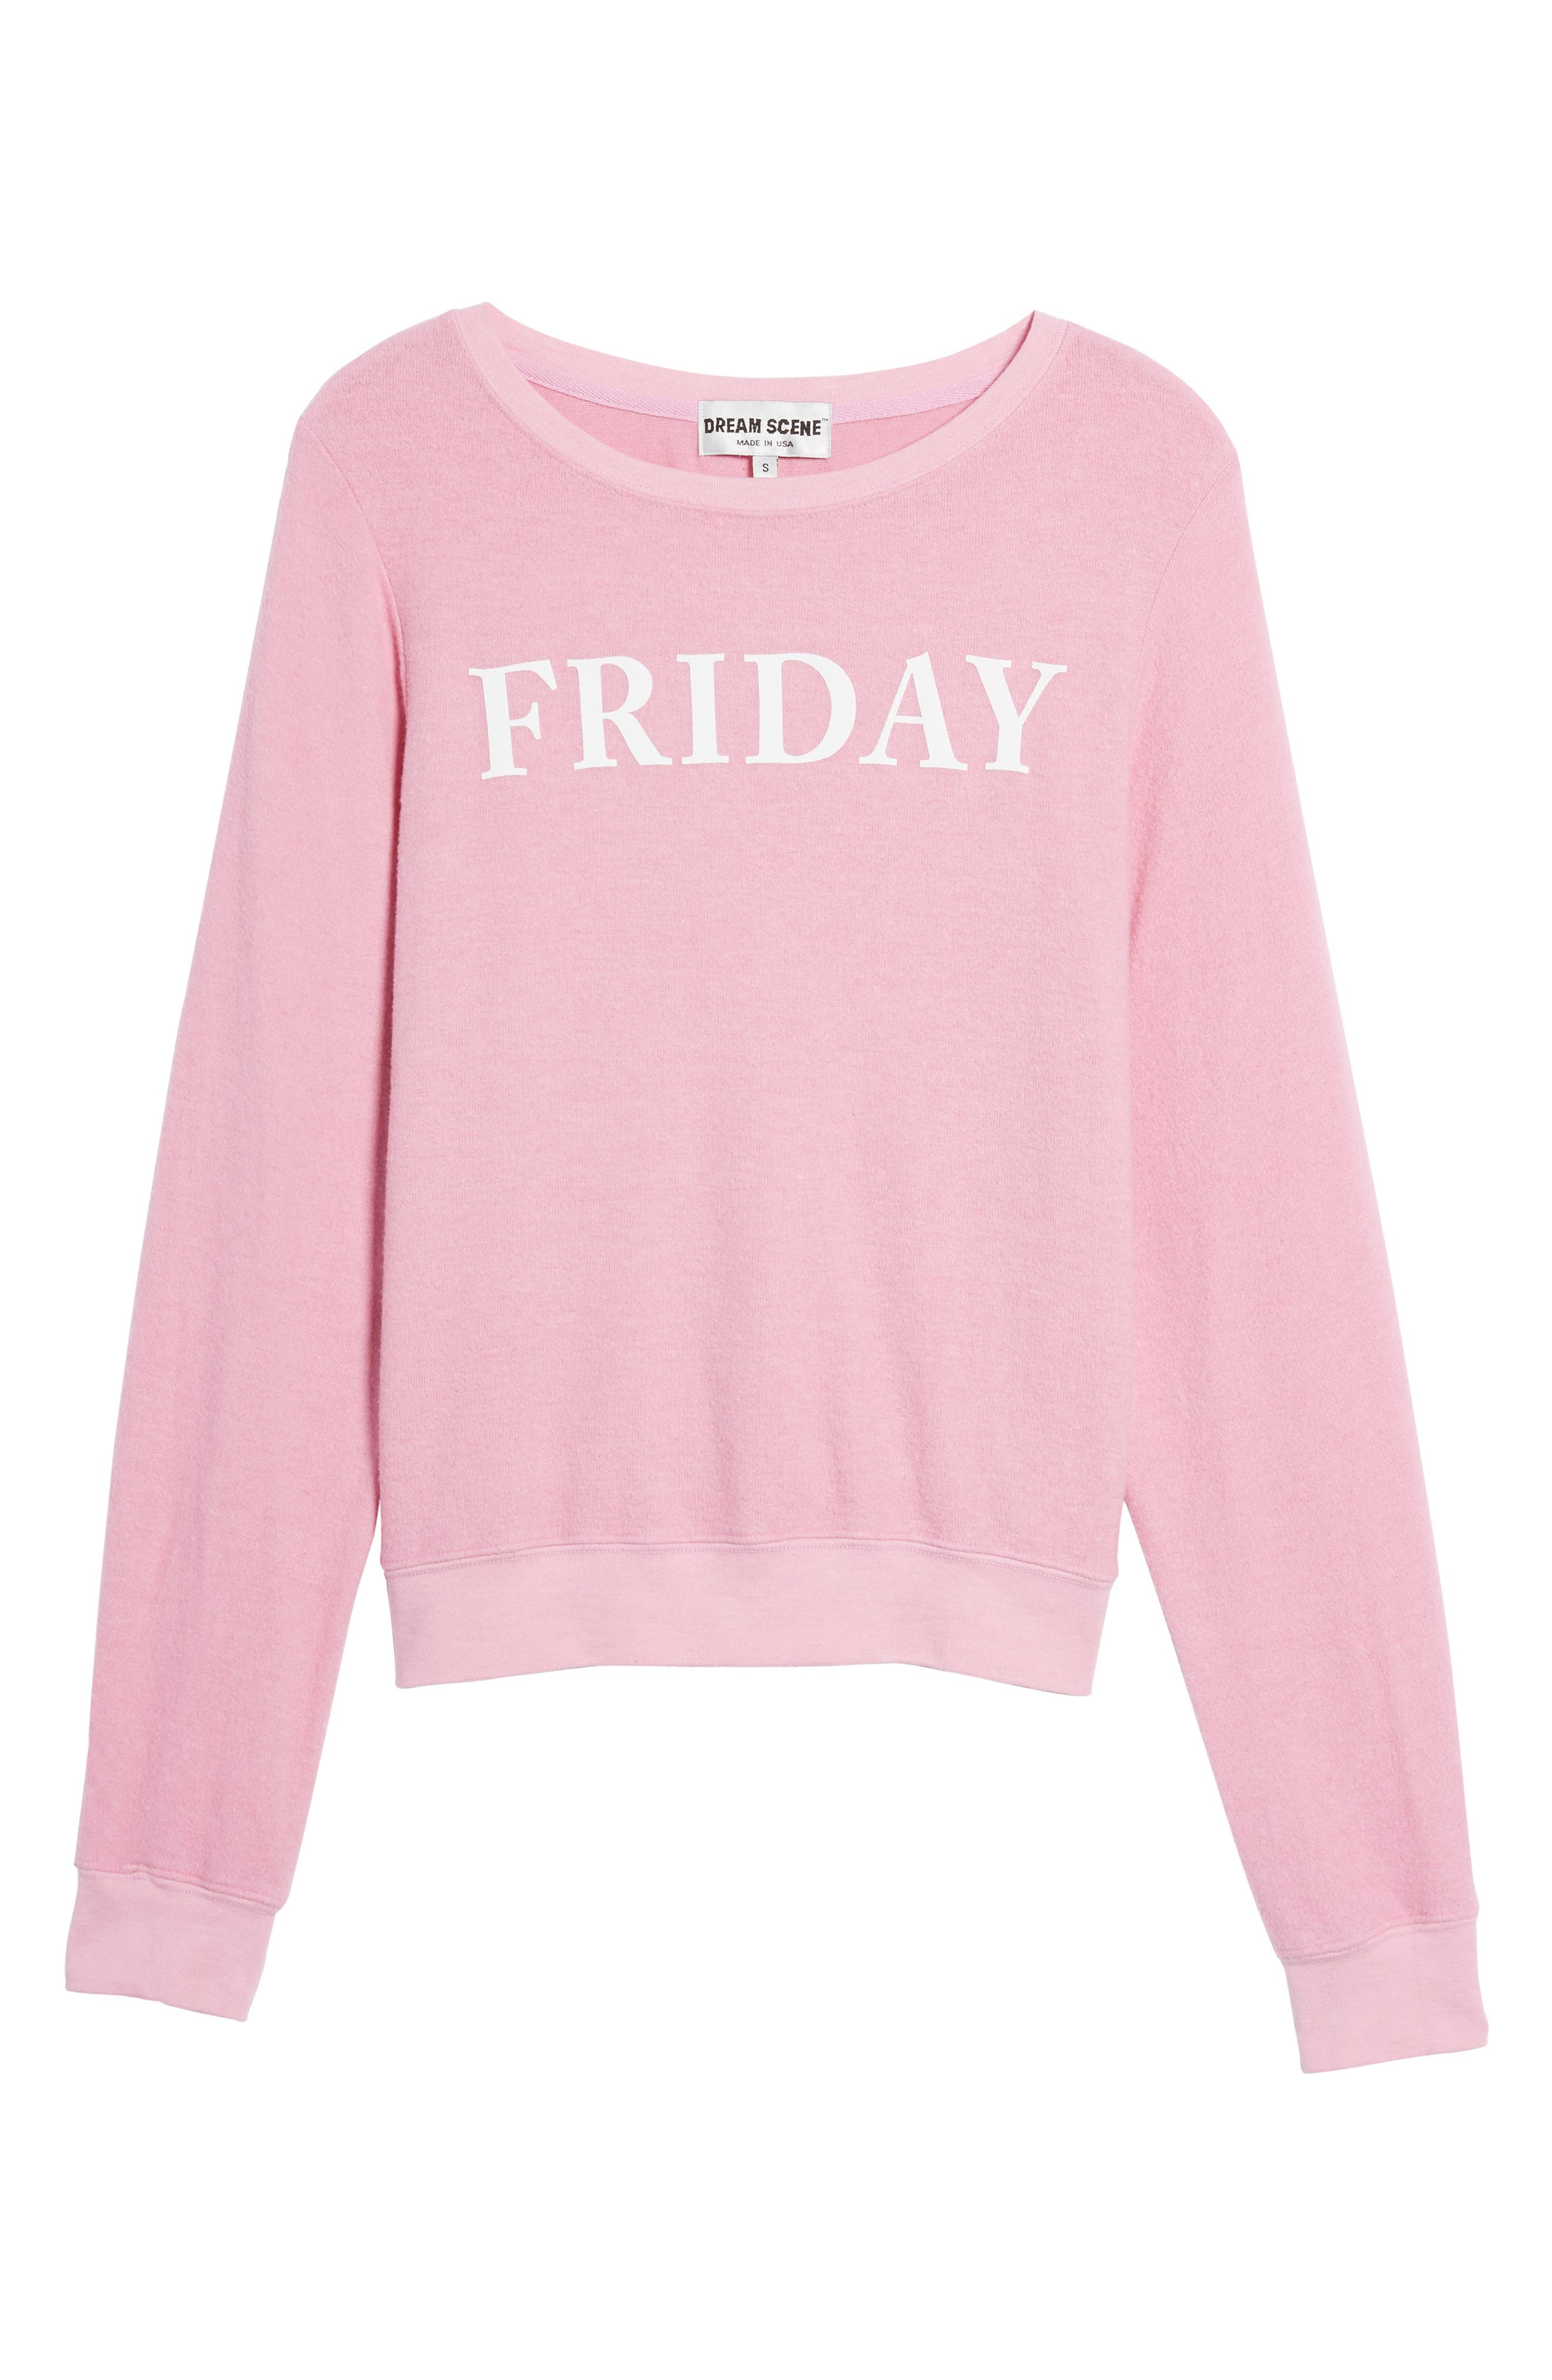 Friday Sweatshirt,                             Alternate thumbnail 6, color,                             650